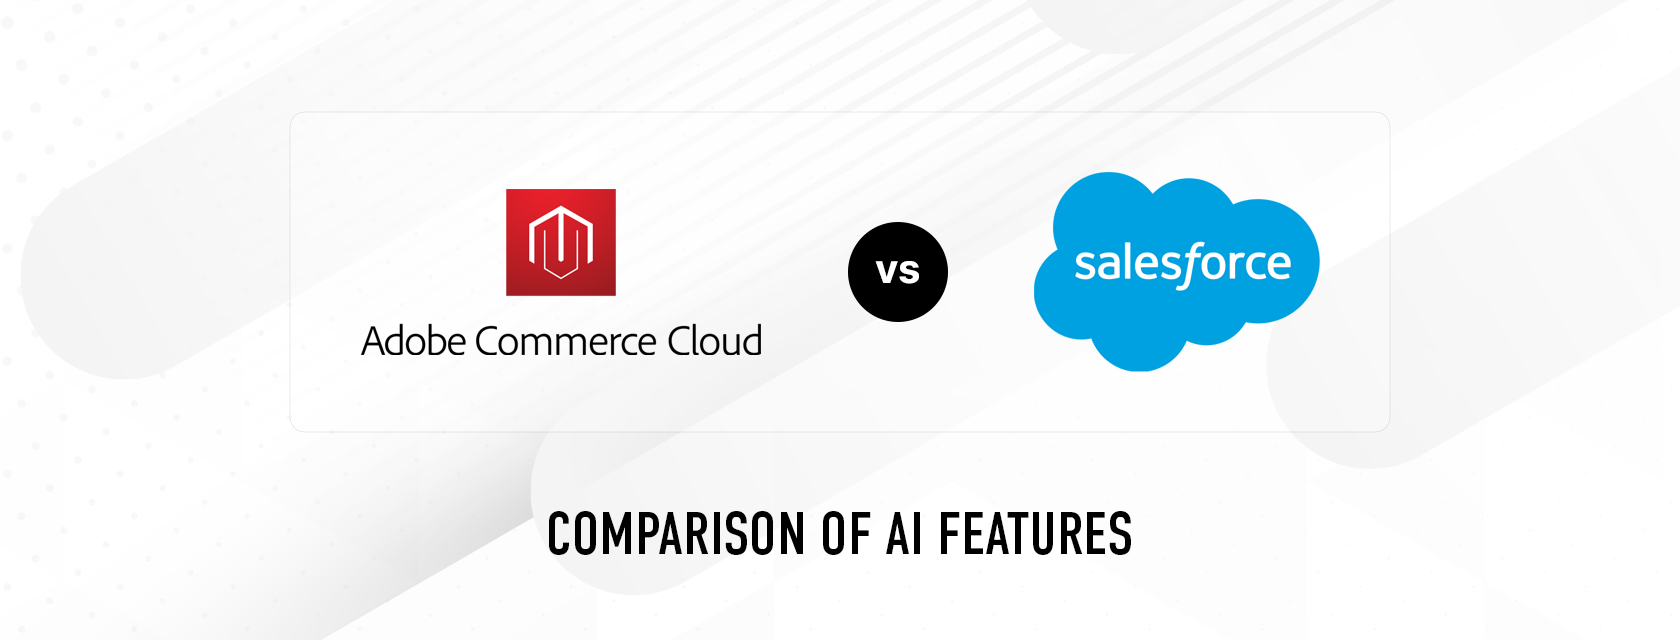 Magento Vs Salesforce: Comparison of AI Features